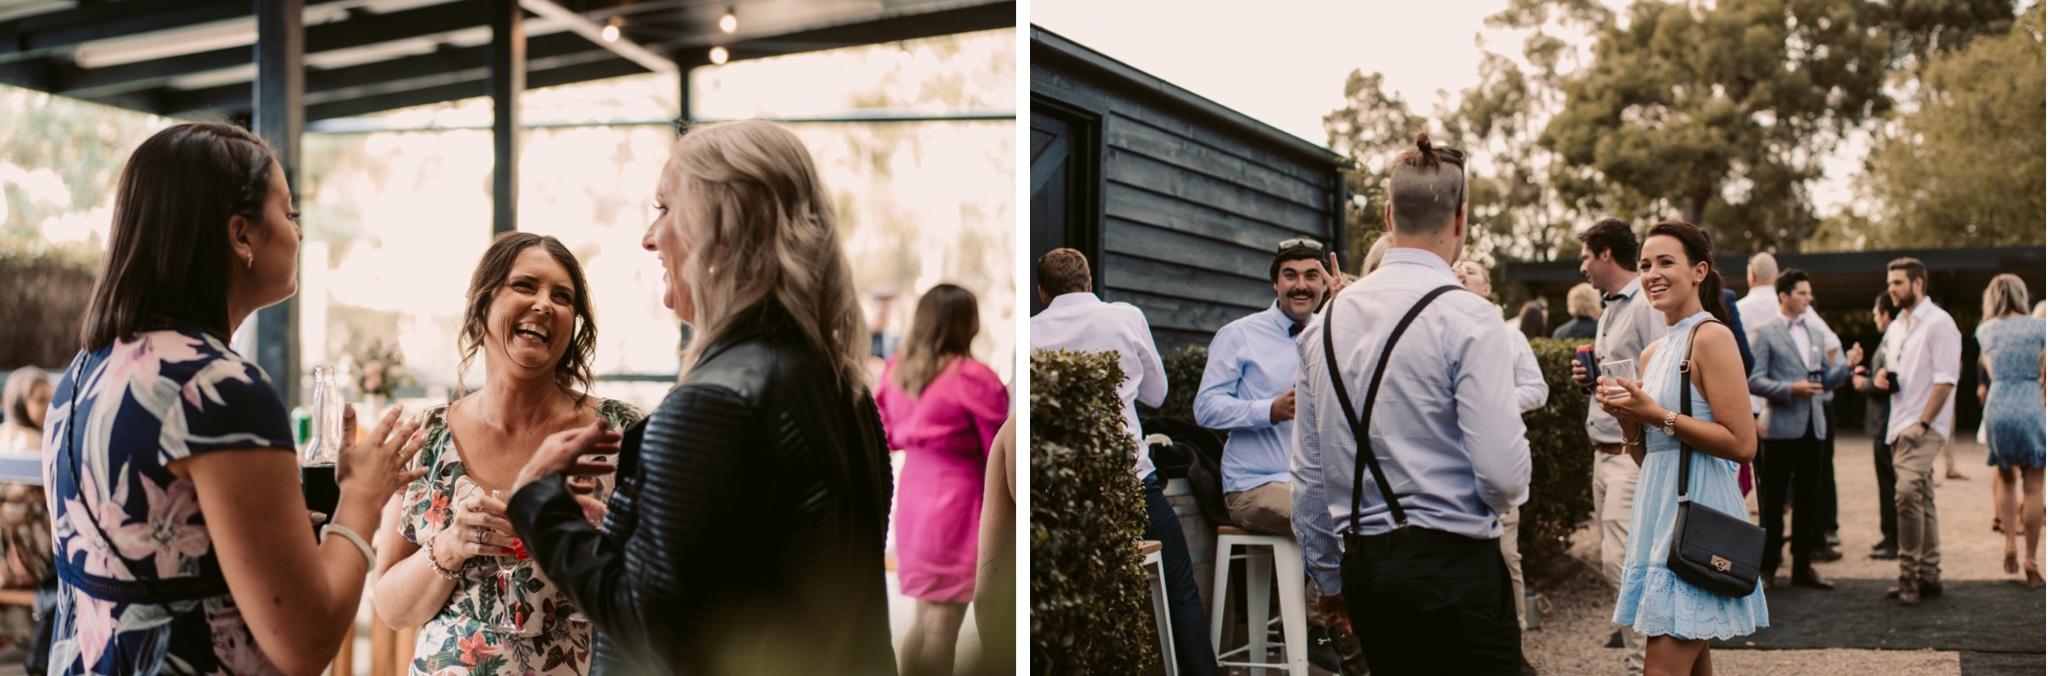 Mornington Peninsula Wedding Photography83.jpg